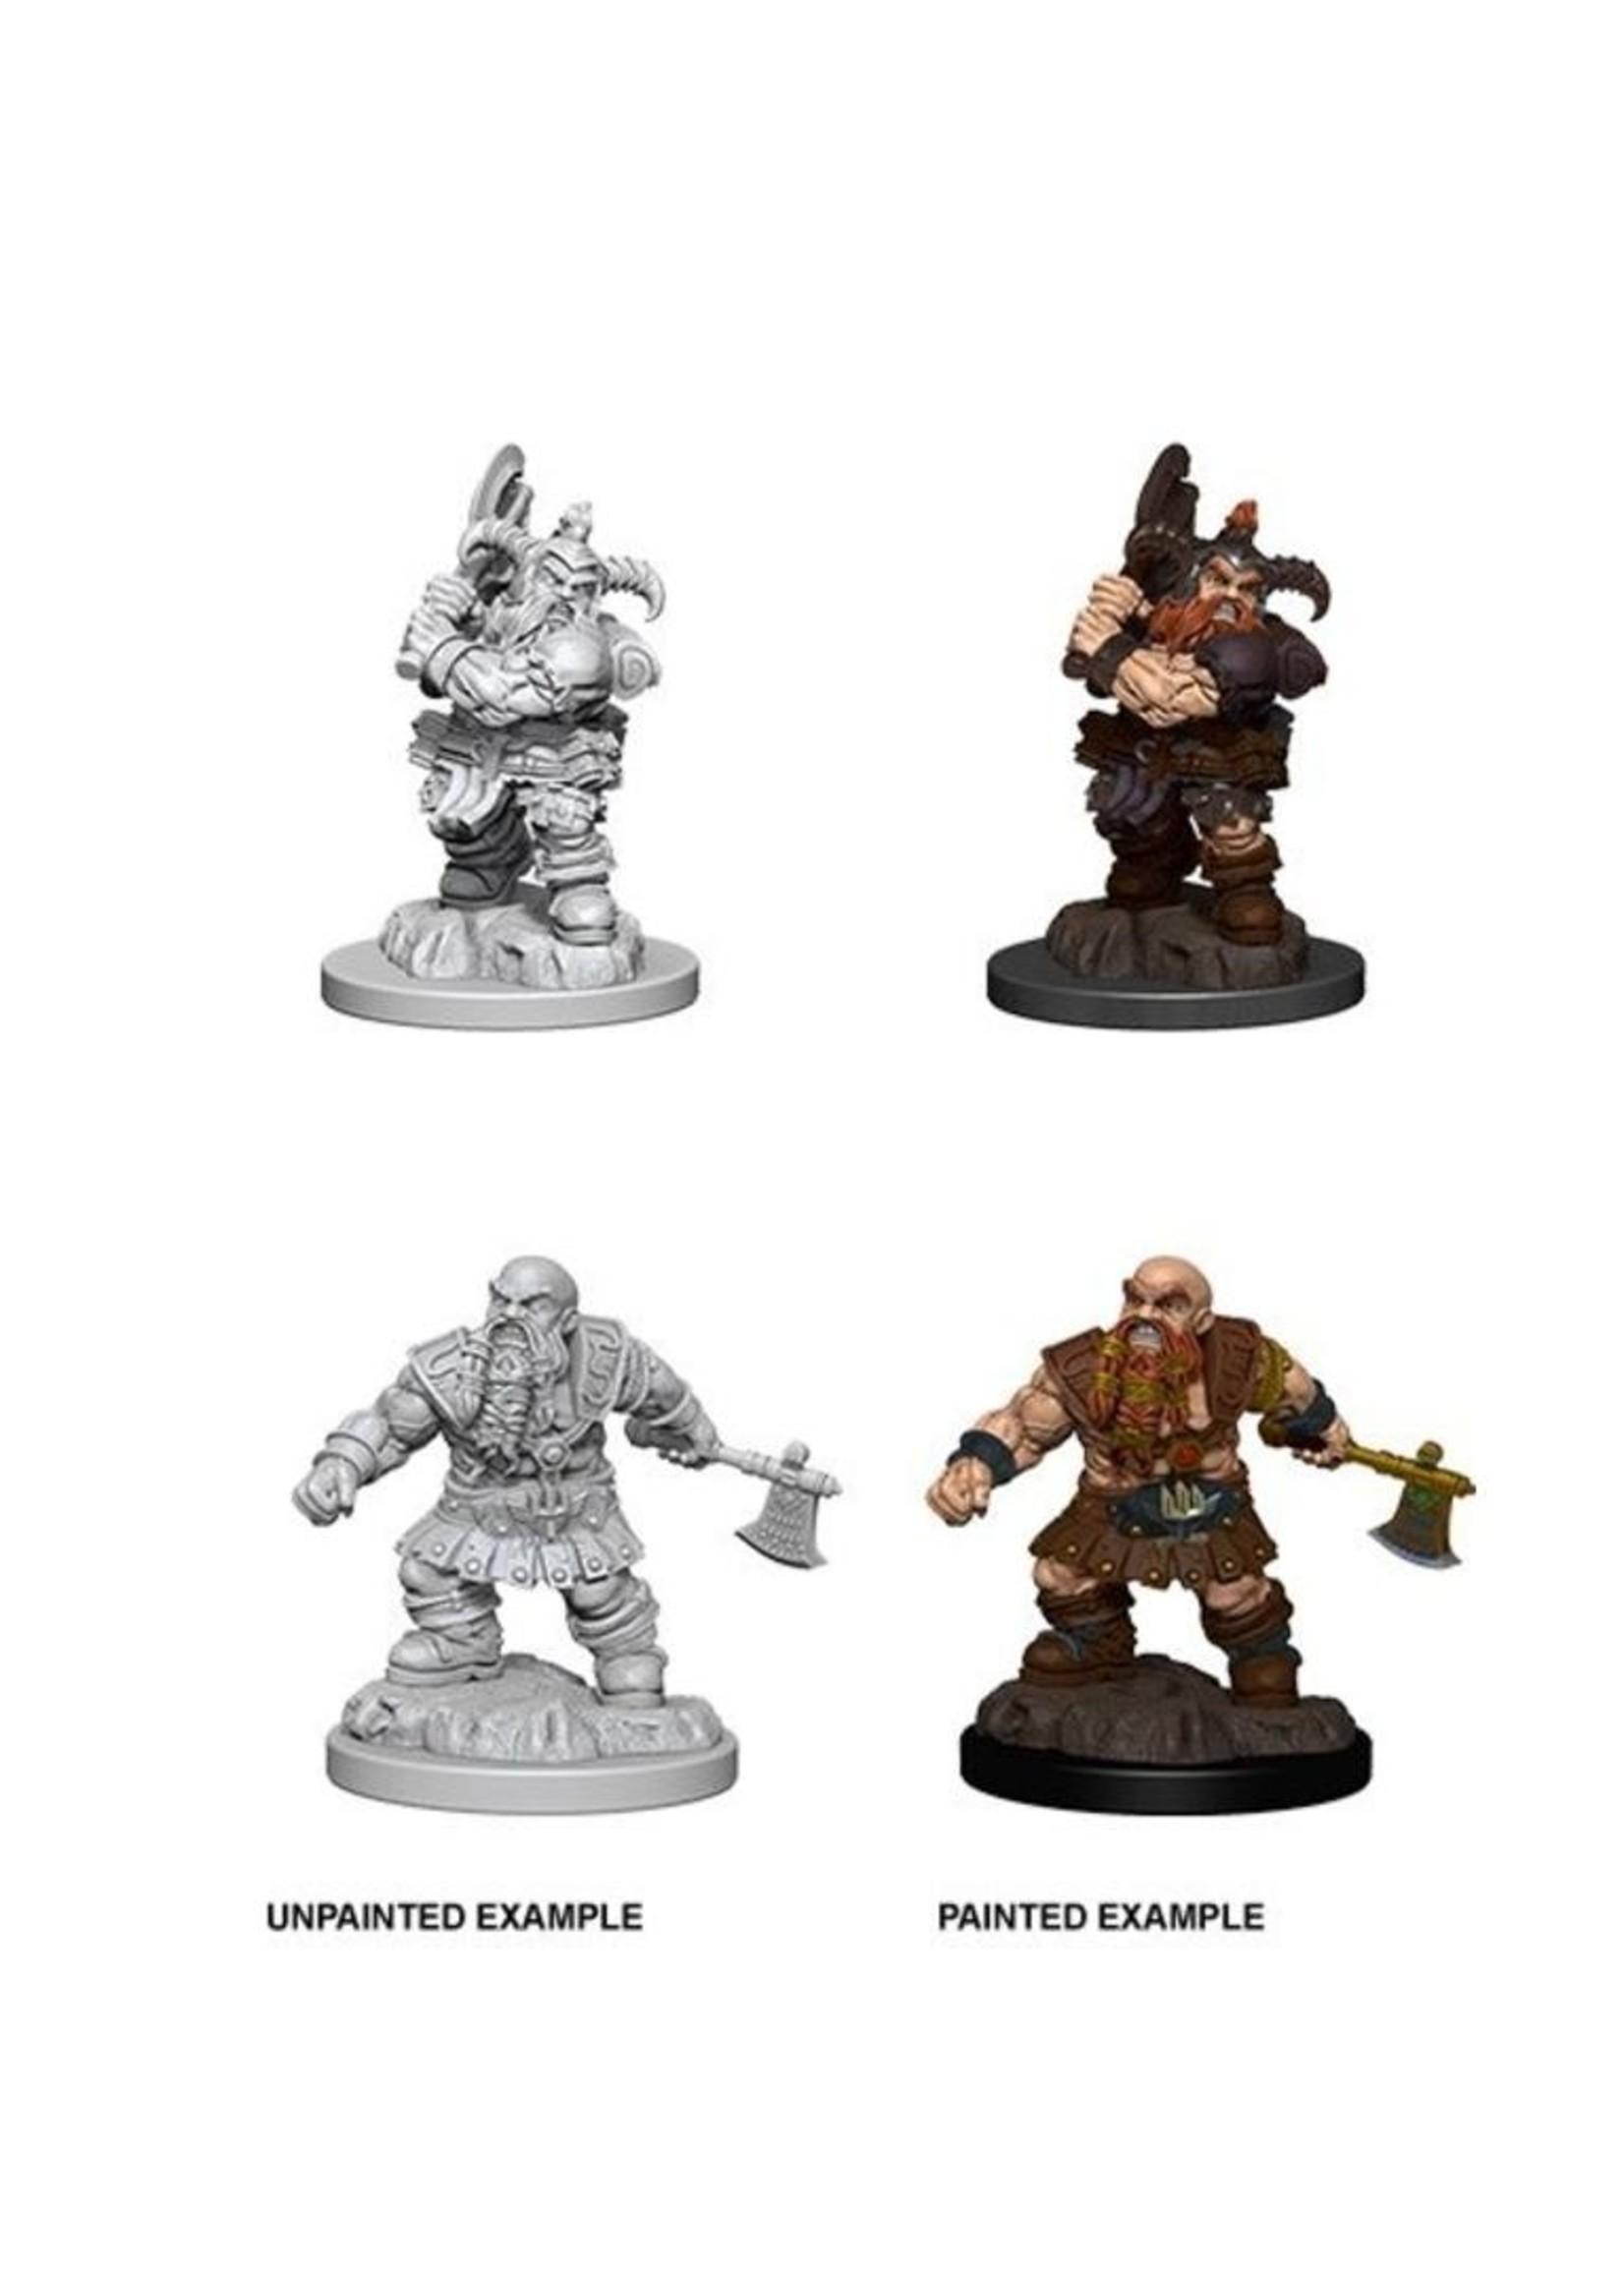 Neca D&D Nolzur's Marvelous Miniatures - Dwarf Barbarian